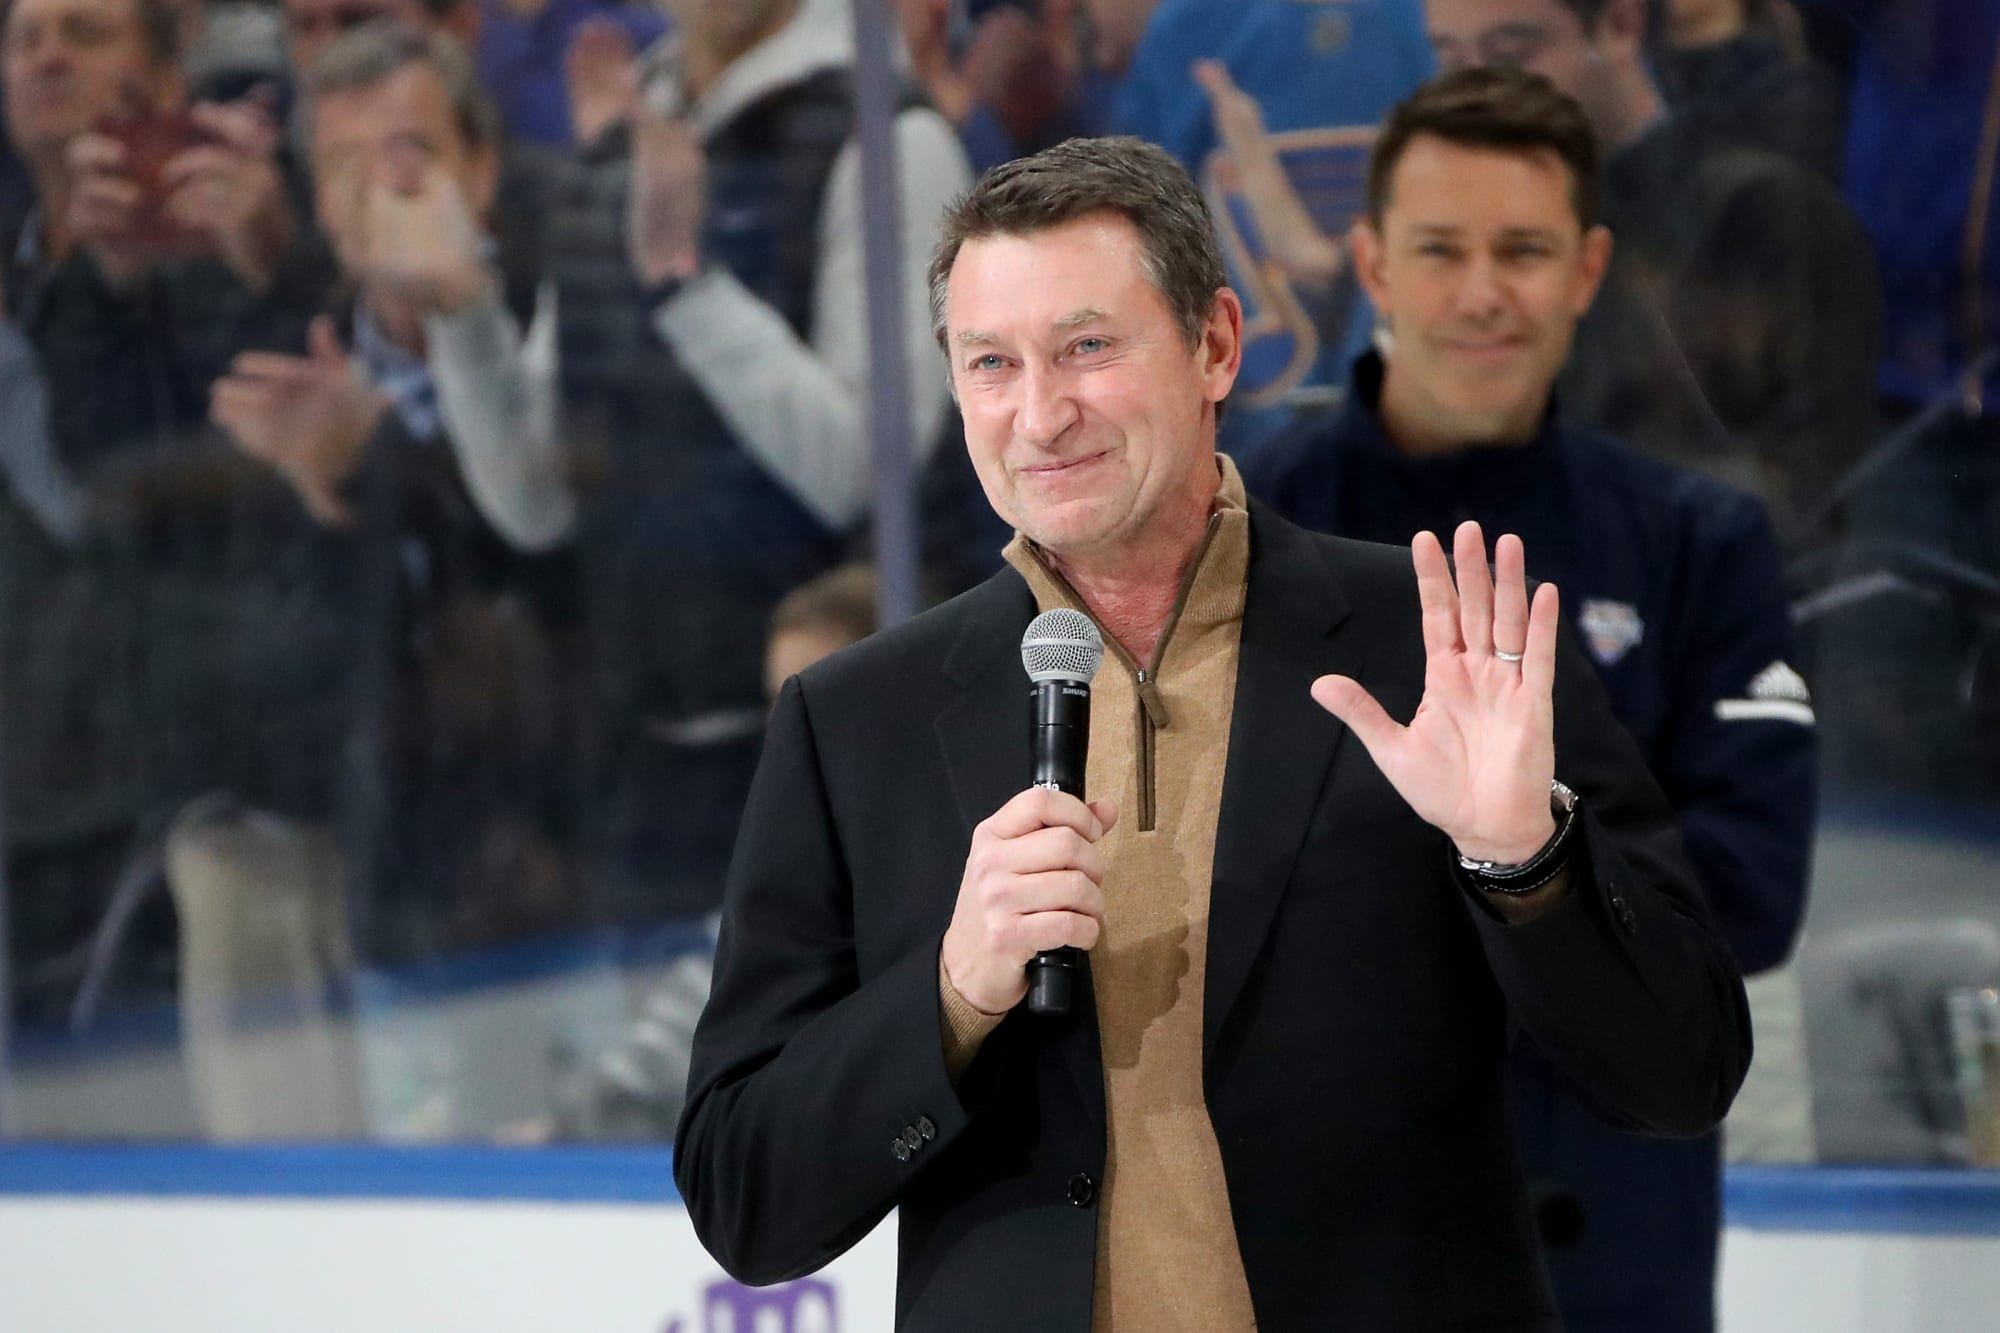 Wayne Gretzky doesn't need 'advice' from former Islanders GM